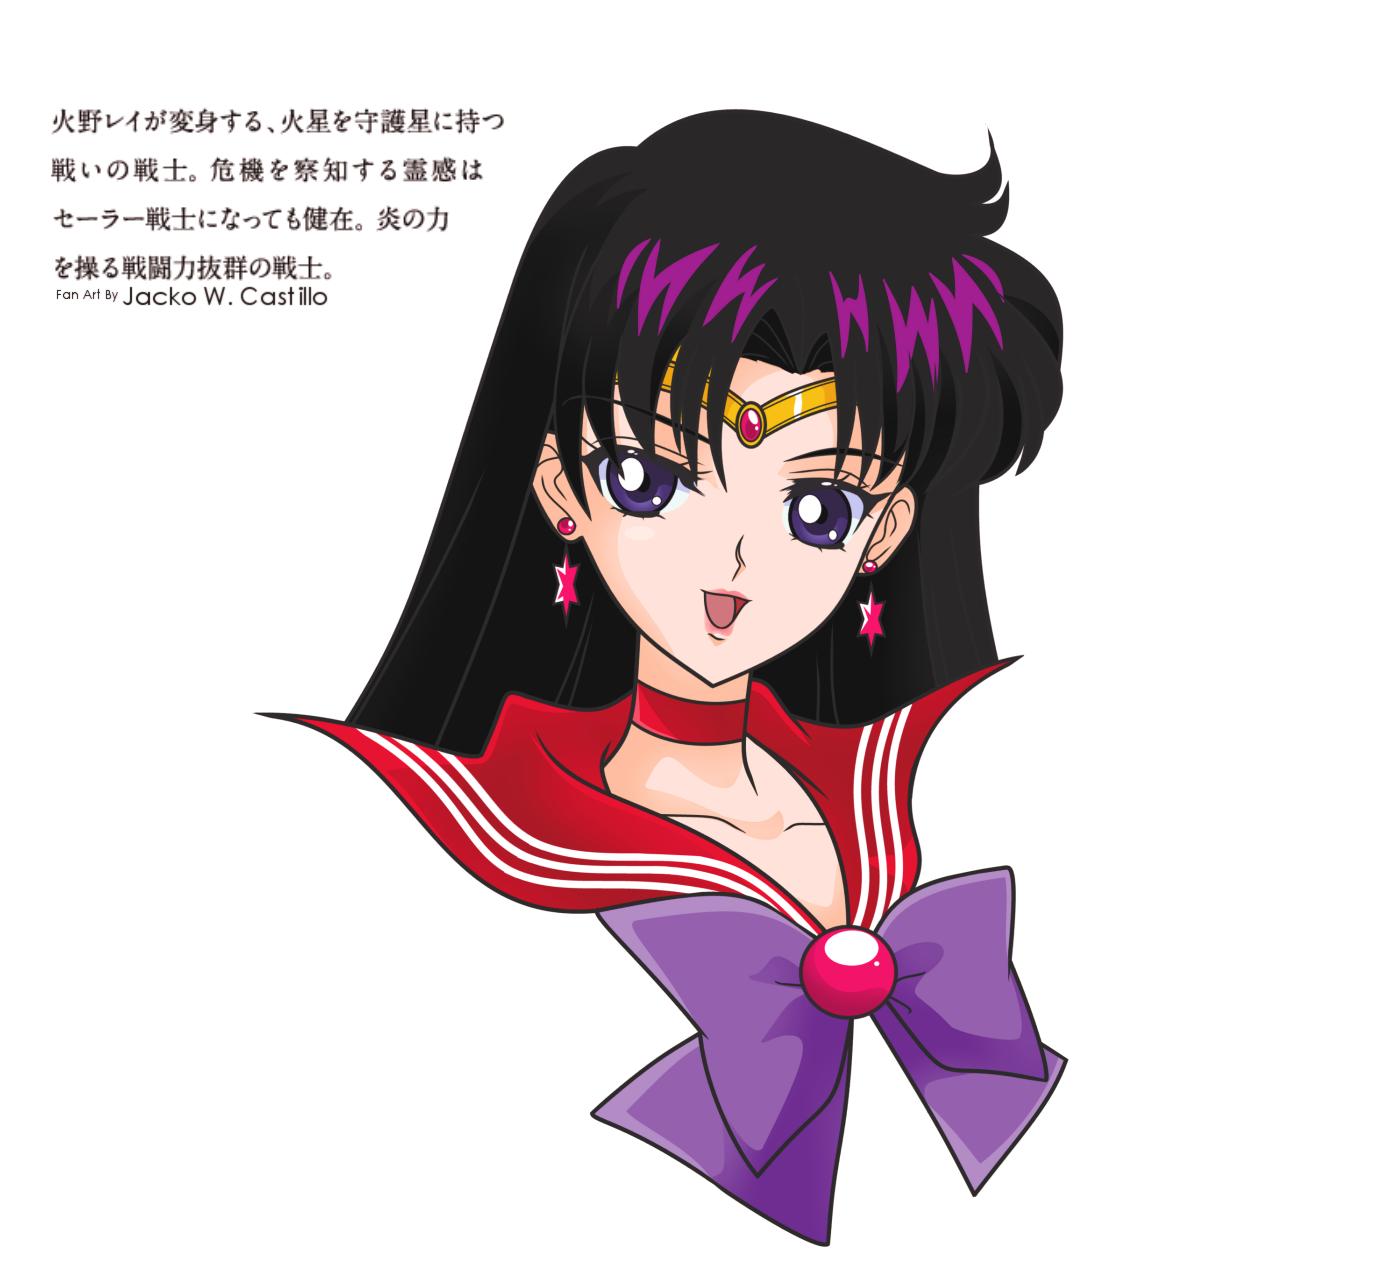 Pin By The Serpent On Bishoujo Senshi Sailor Moon Sailor Mars Sailor Moon Mars Sailor Moon Crystal